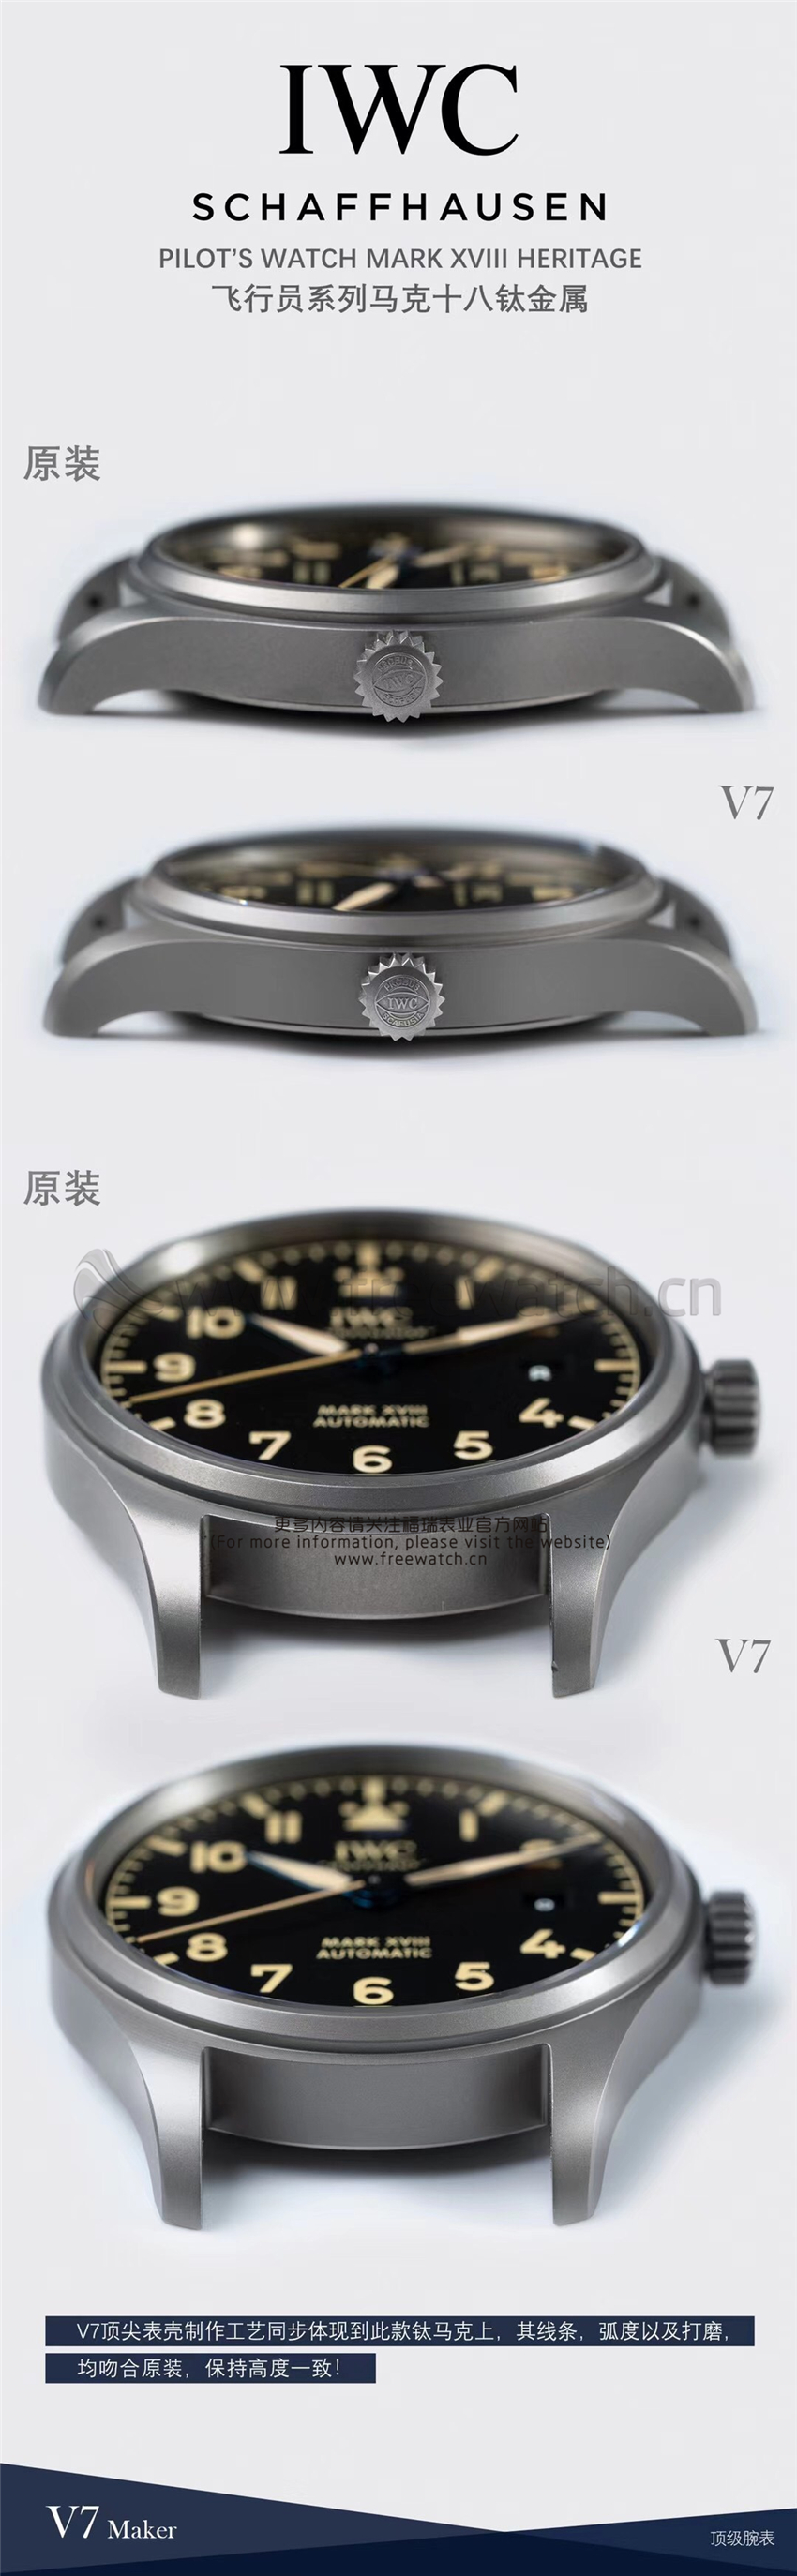 V7厂万国马克十八钛合金IW327006对比正品评测-第3张